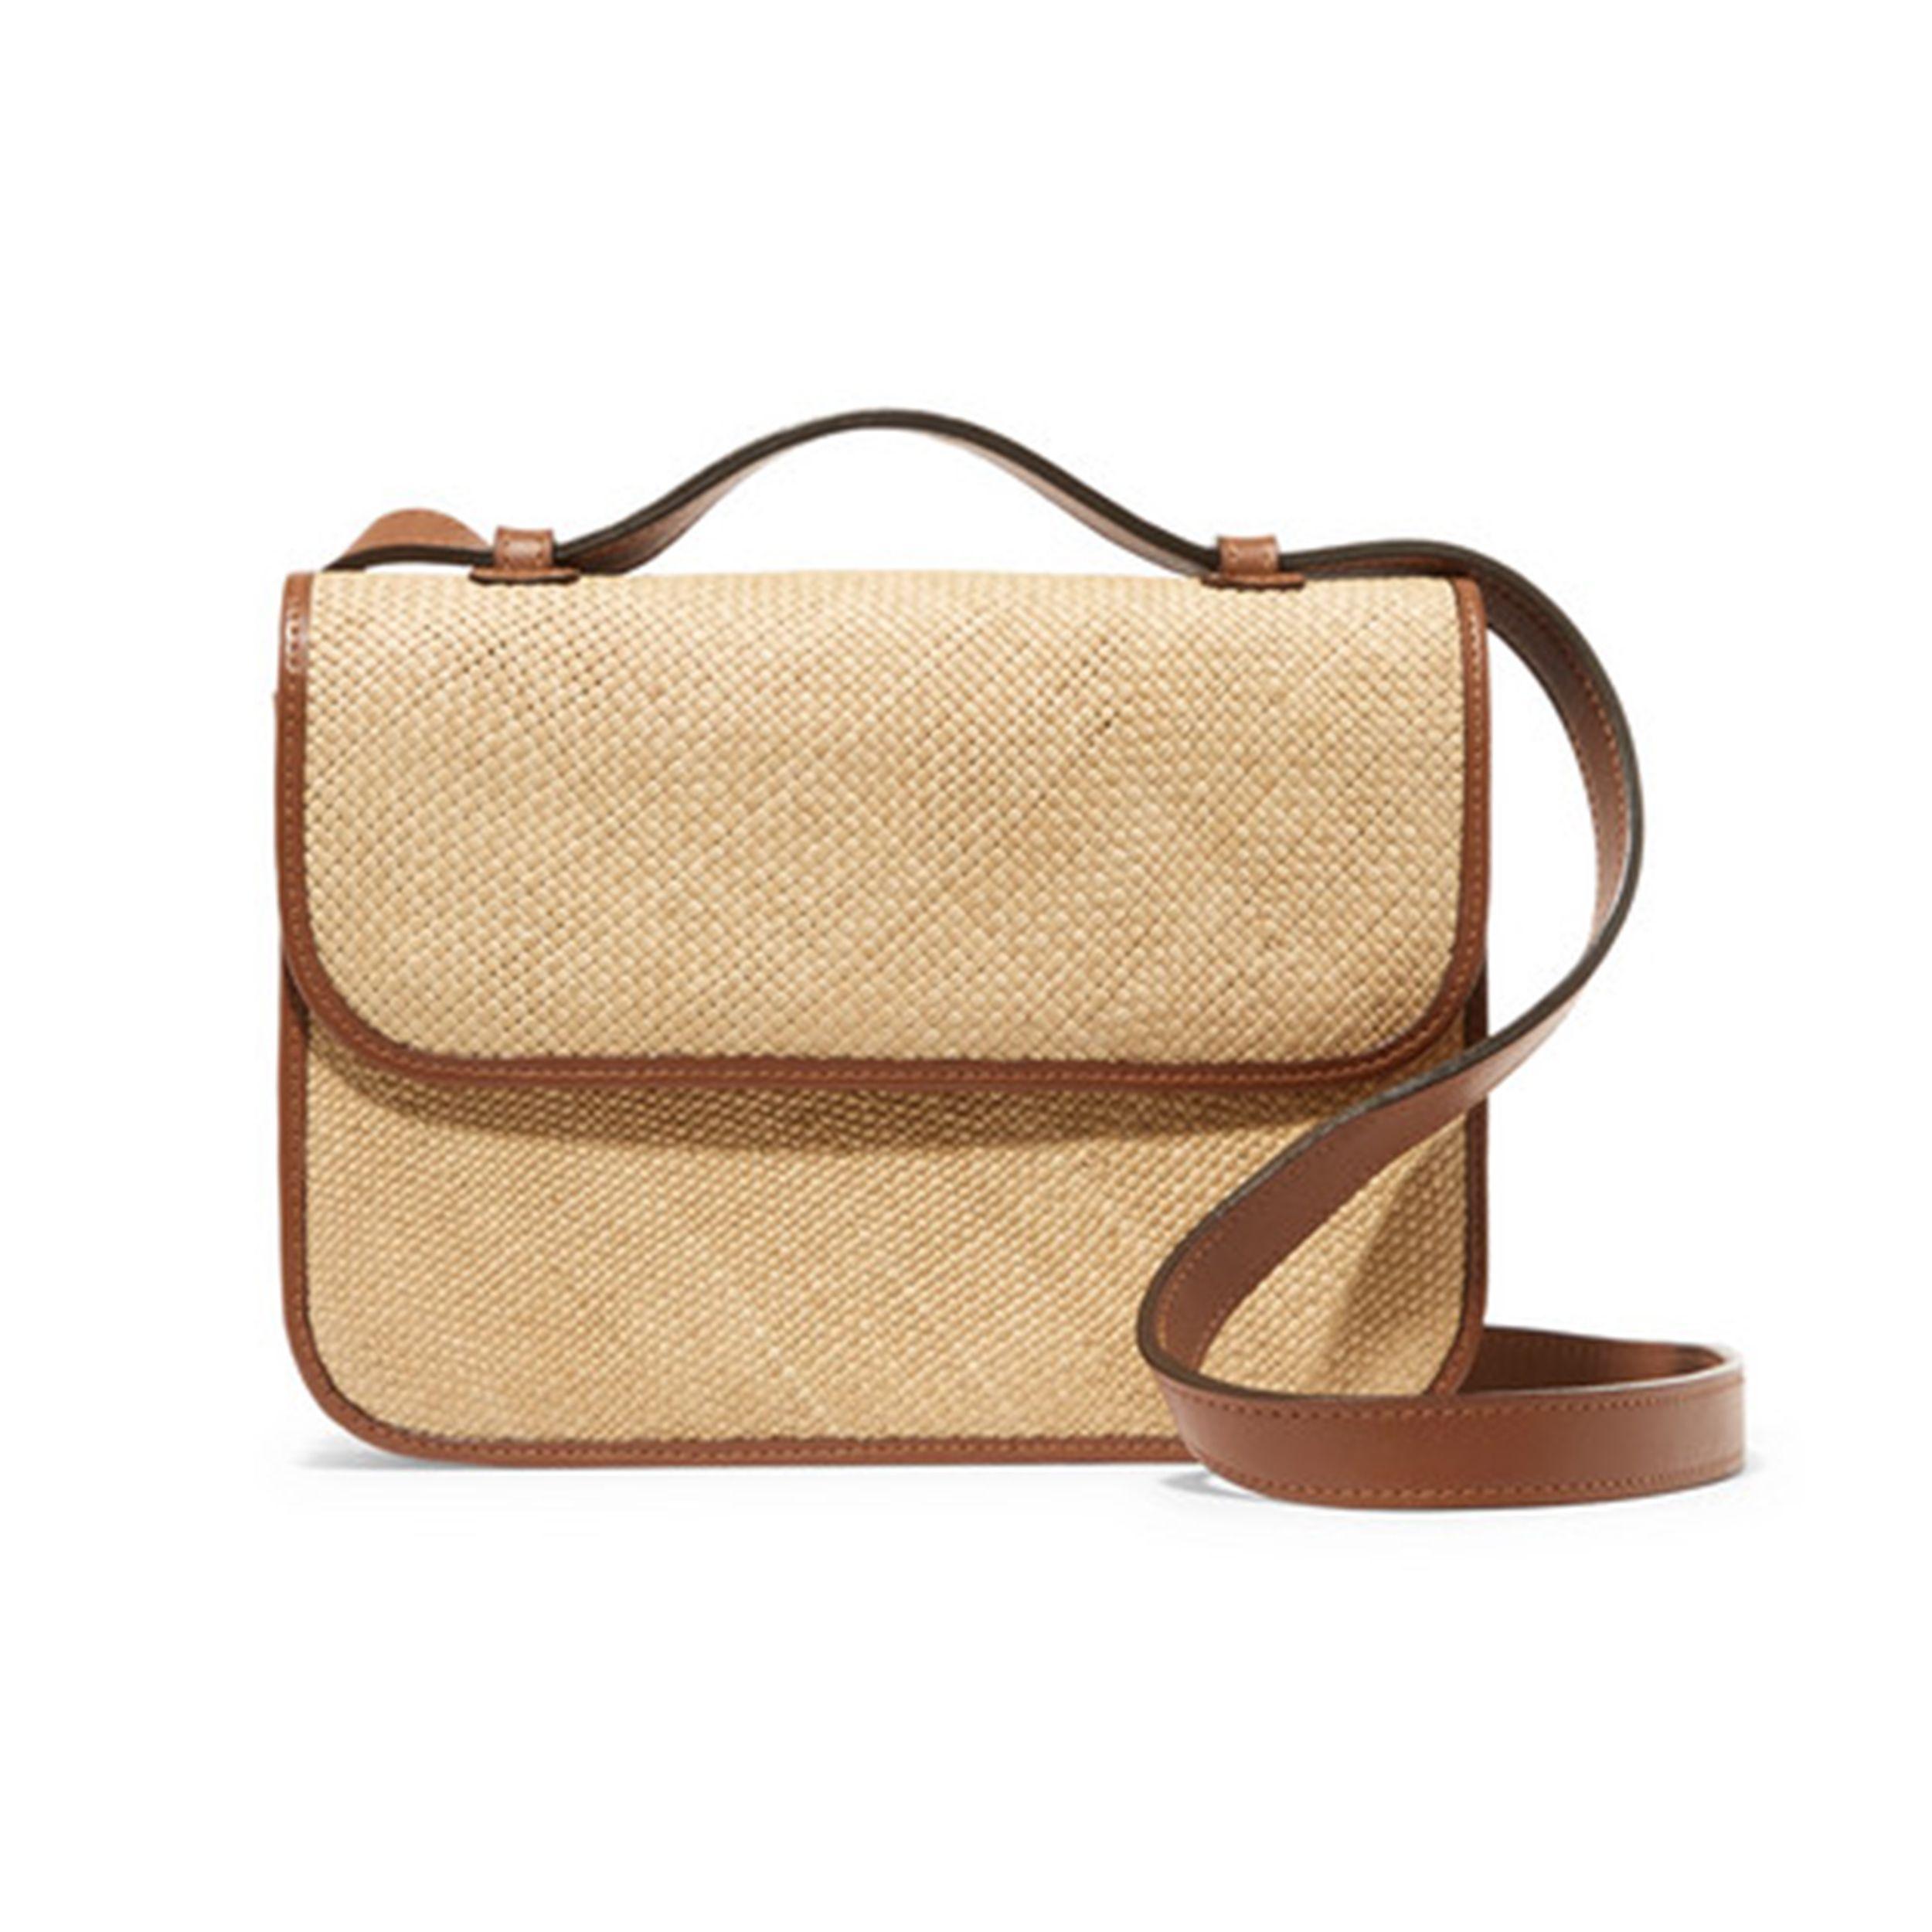 Iraca raffia and leather shoulder bag